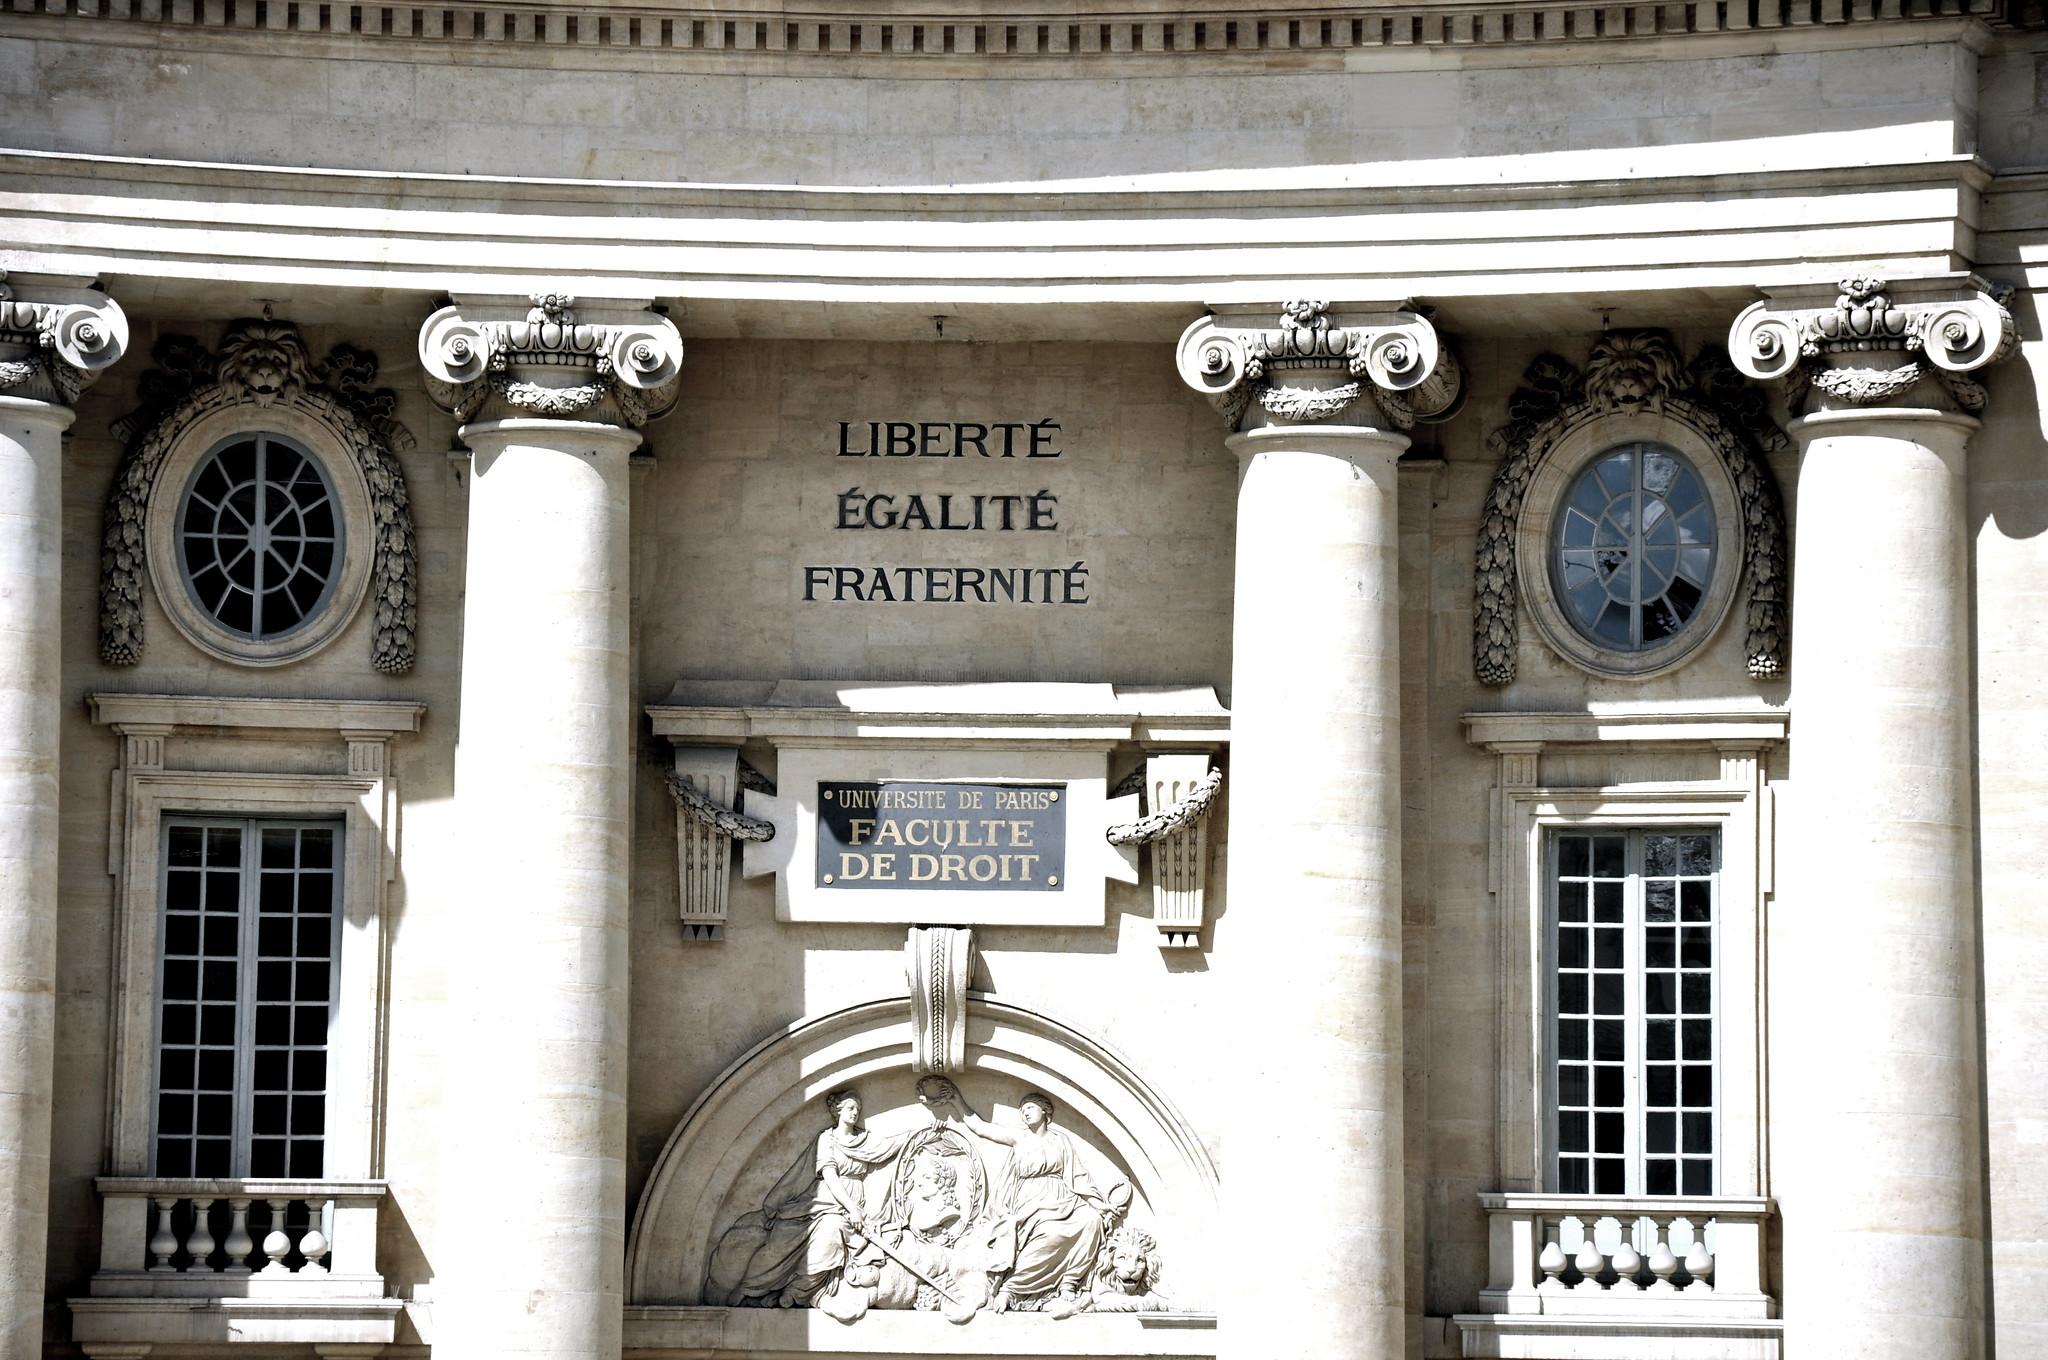 Liberte, Egalite, Fraternite. Image credit: Easal on Creative Commons.